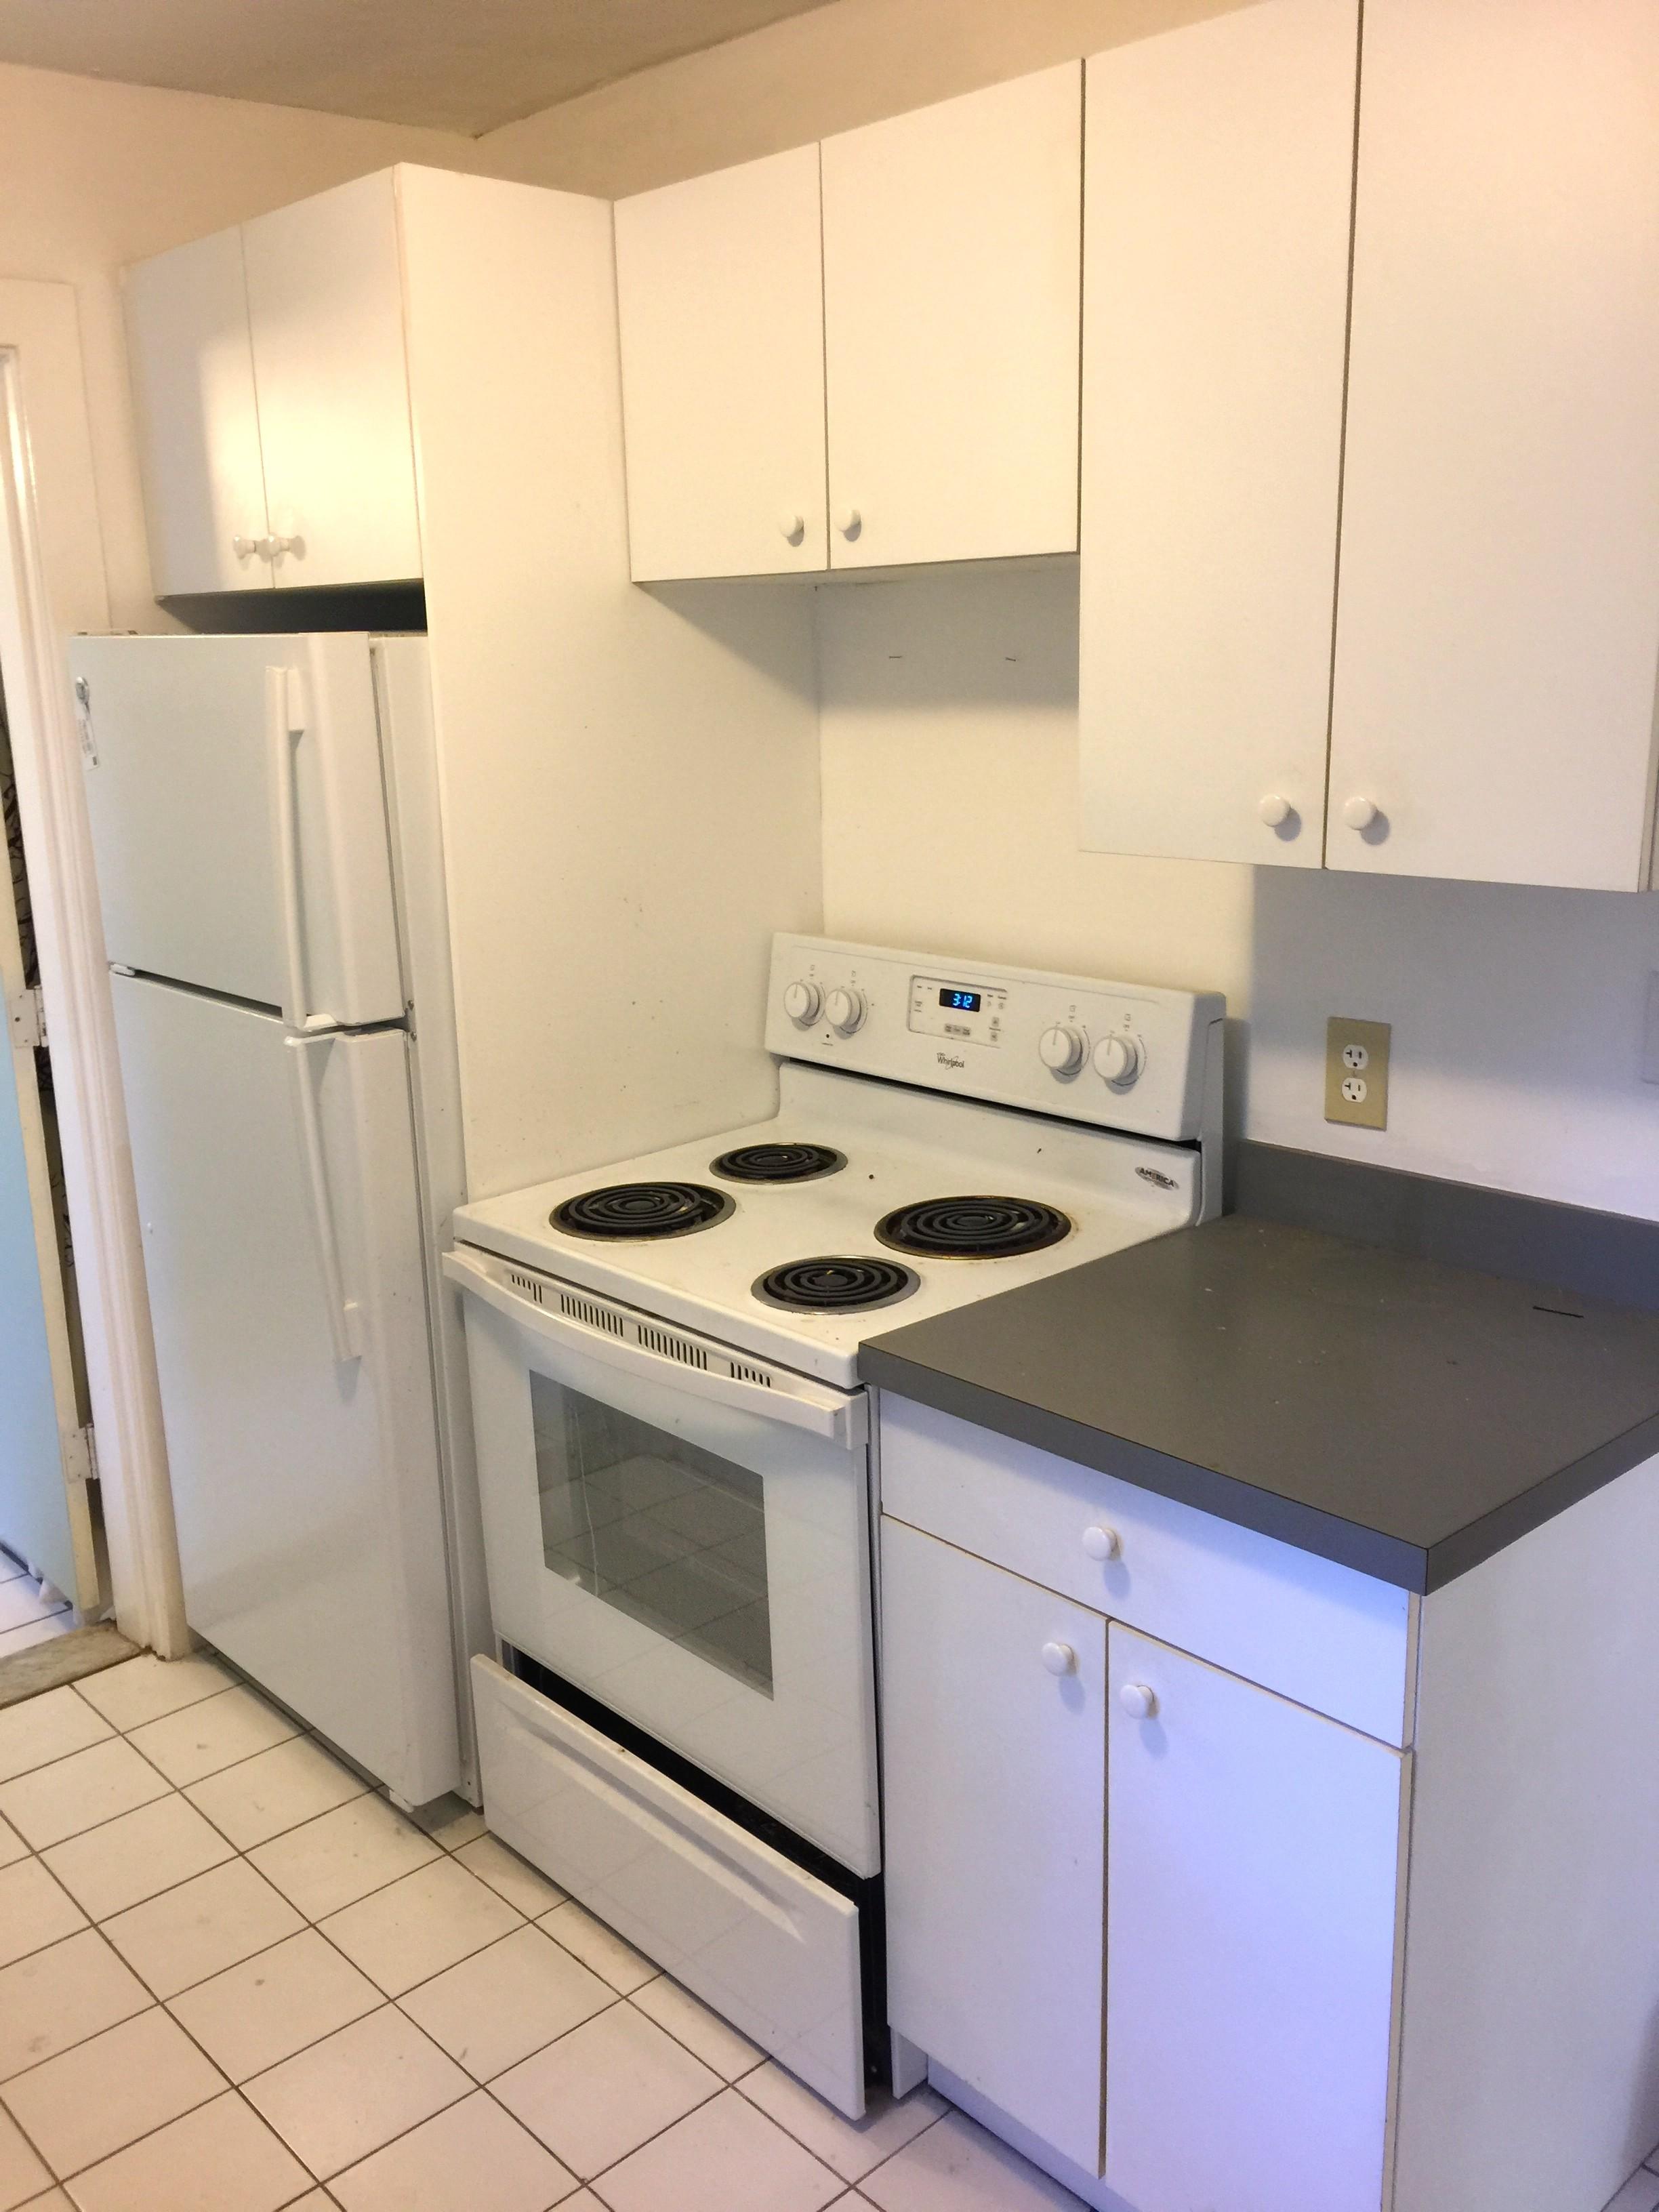 Yorktown St B Somerville Ma 02144 2 Bedroom Apartment For Rent Padmapper